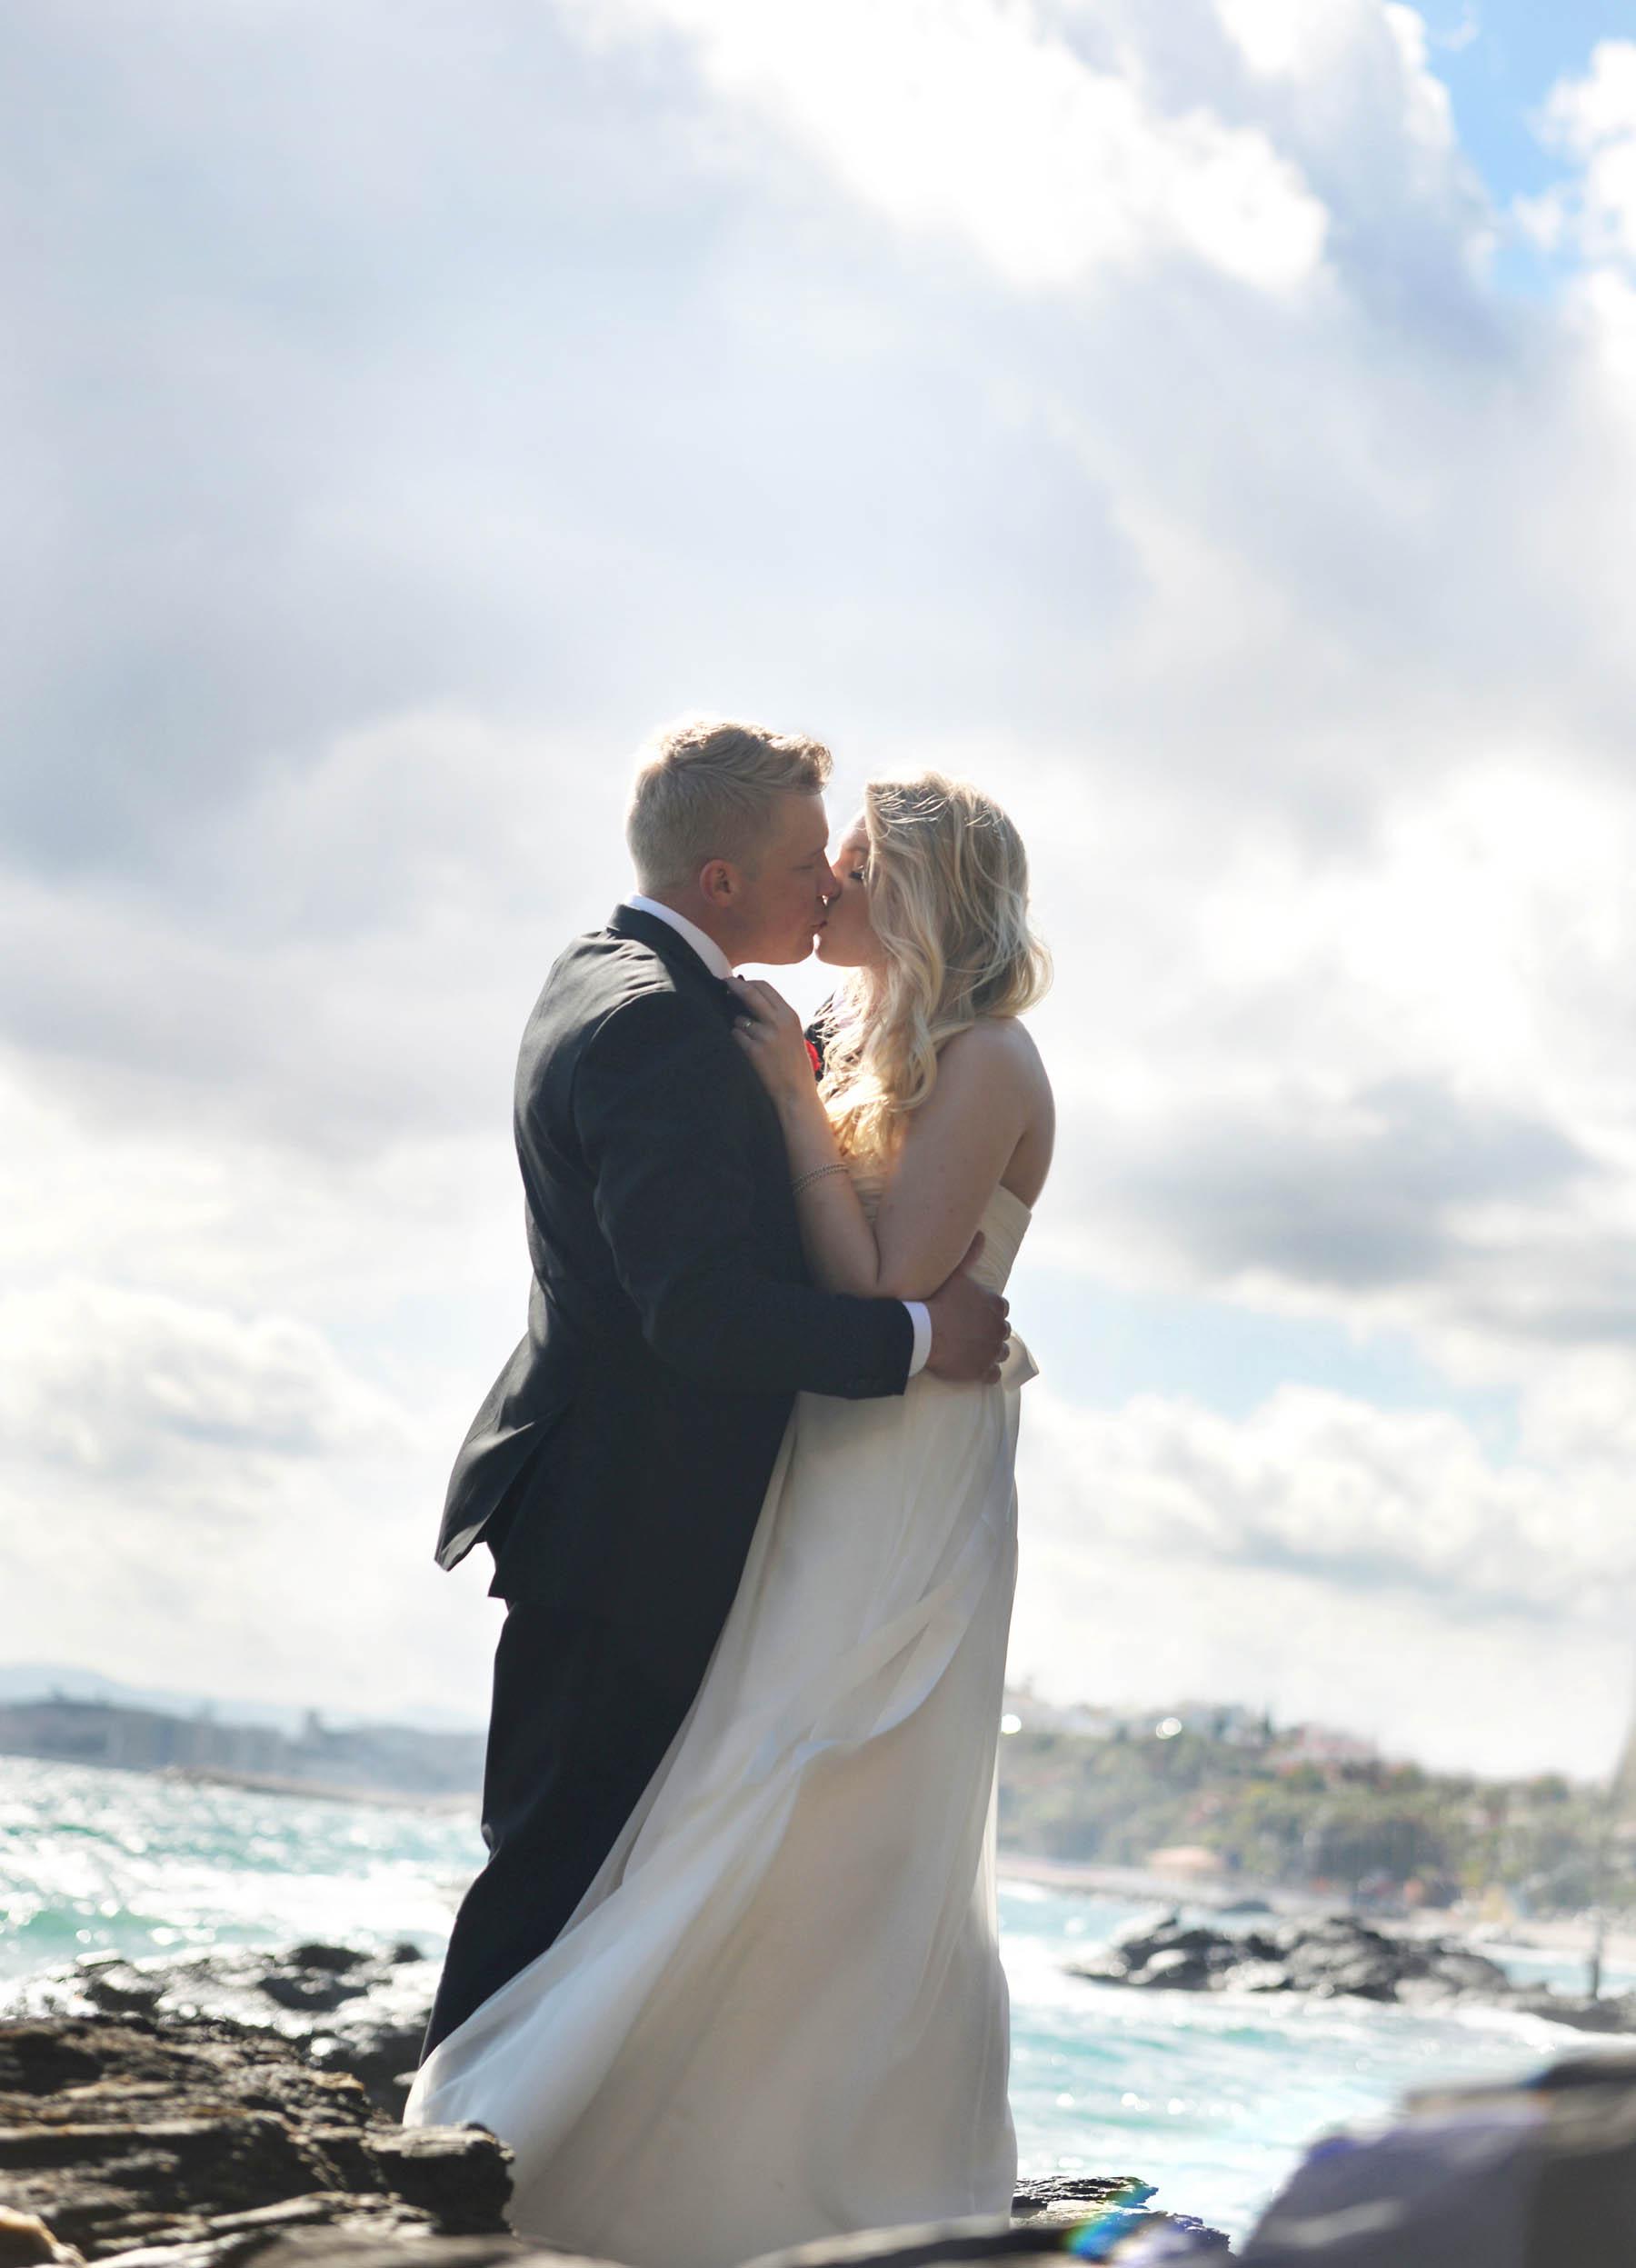 marbella mejores fotografos de boda